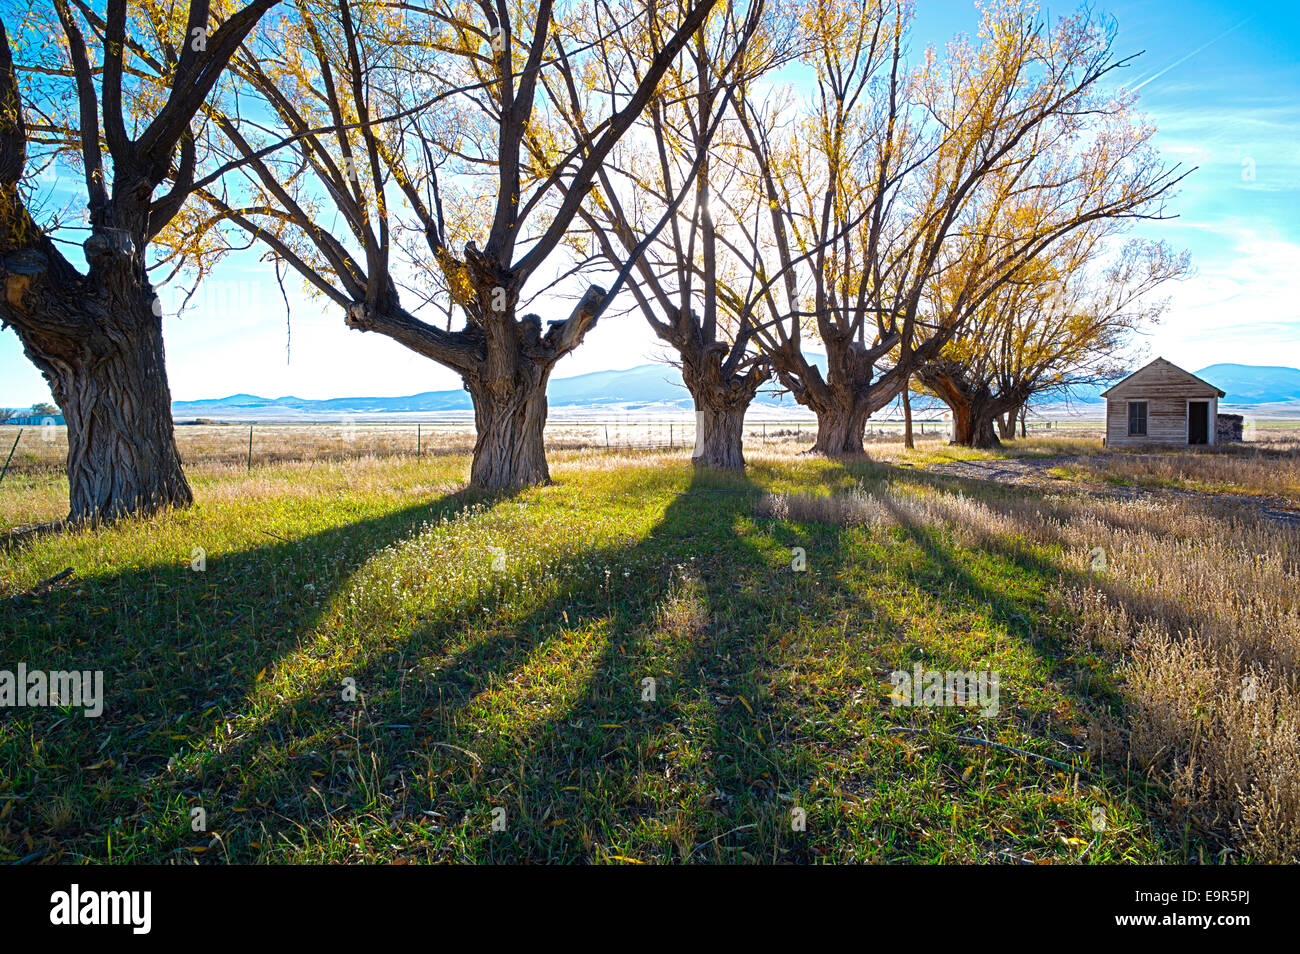 Fremont's Cottonwood trees on abandoned ranch, Monte Vista National Wildlife Refuge, Central Colorado, USA - Stock Image